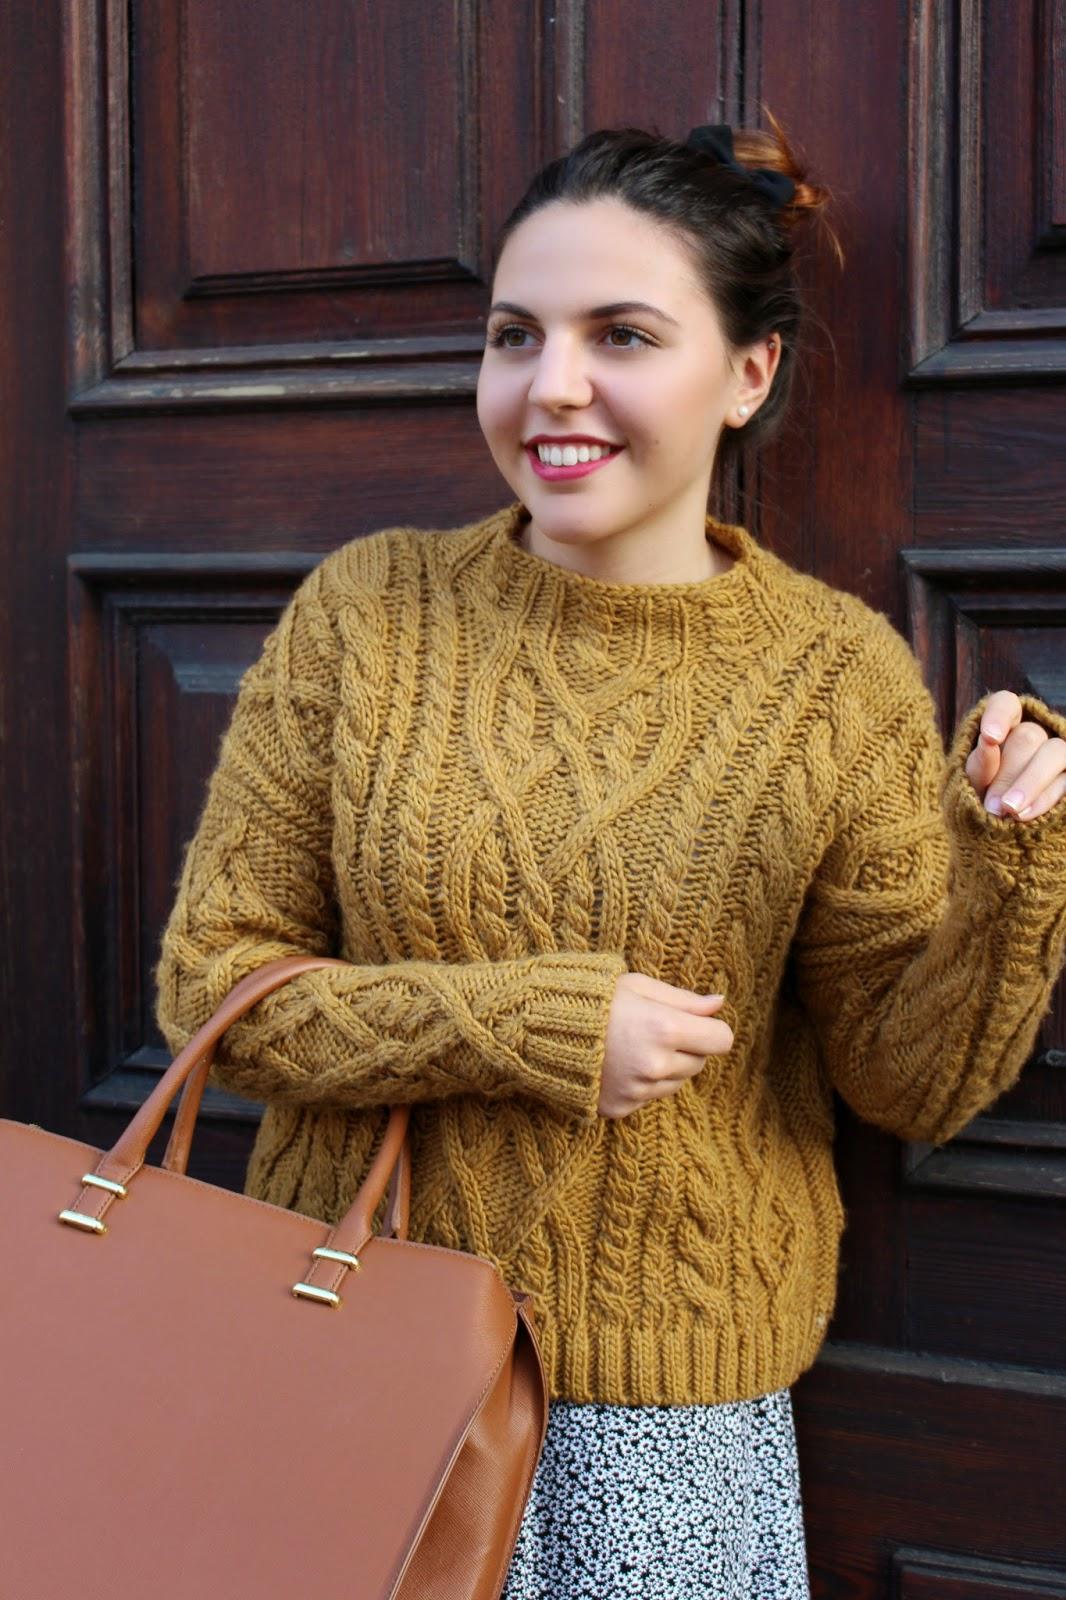 b40d32aad4 ... Black Floral Leather Slap Backpack. Mango Cable-knit Wool-blend Sweater  // Subdued High Waisted Skirt // H&M Handbag // Rimmel Kate Moss Lipstick  n.107